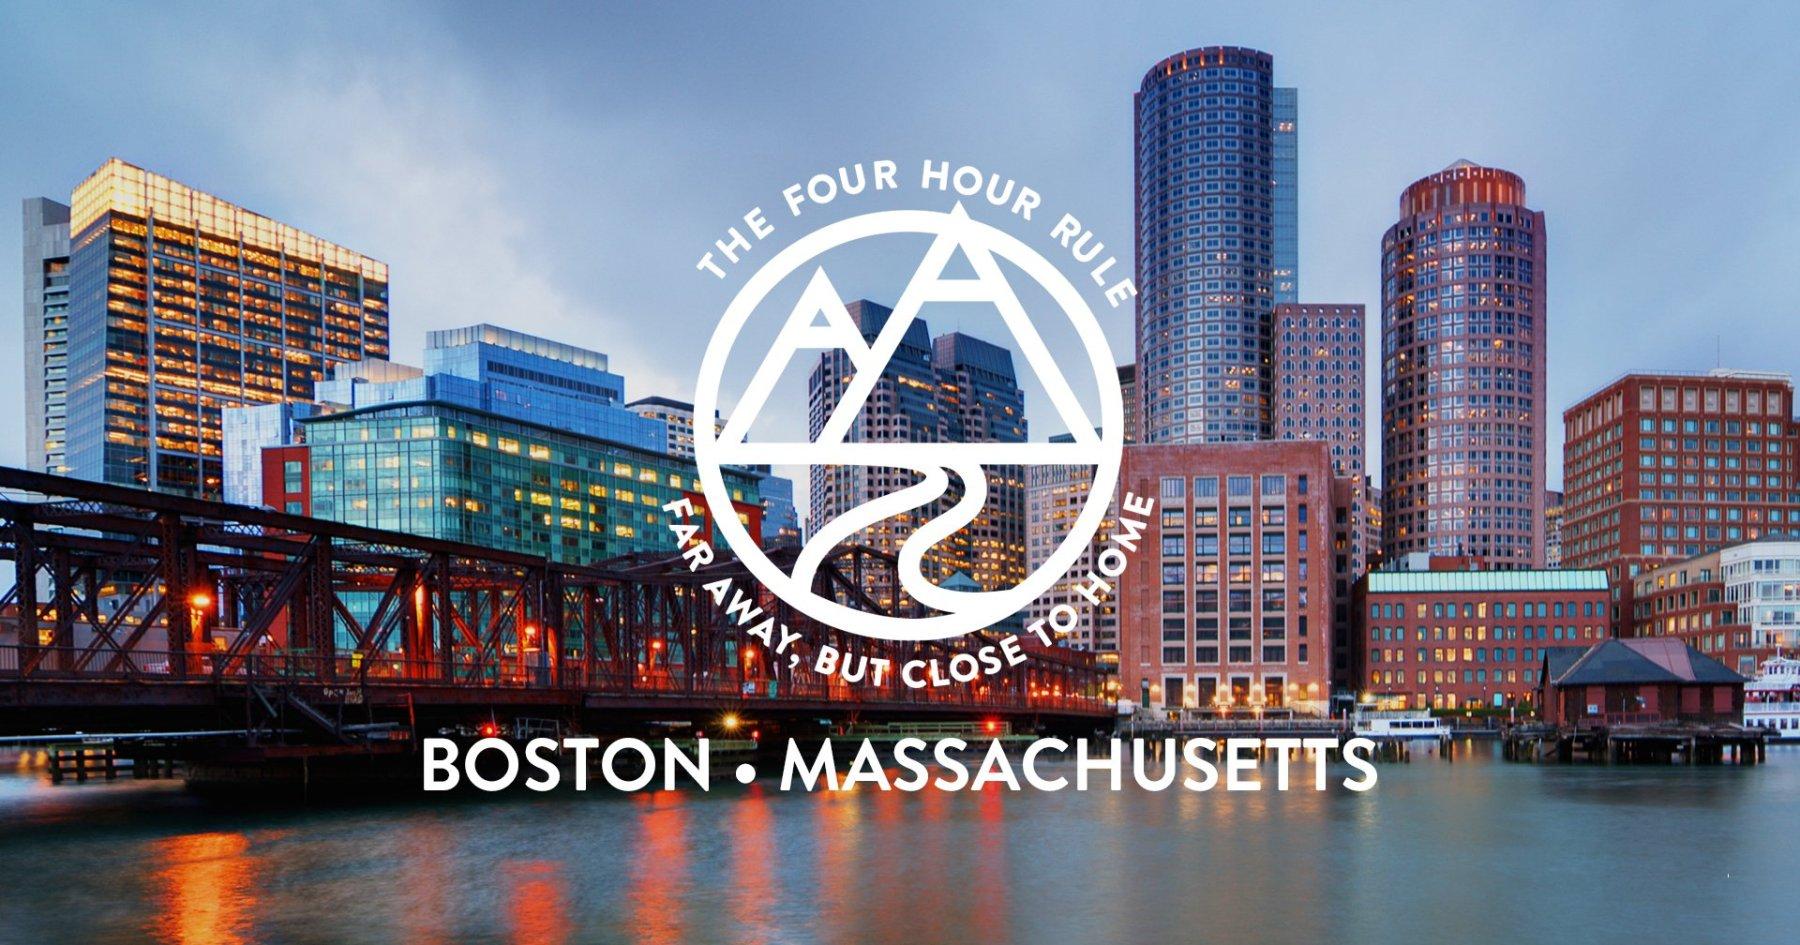 4-Hour Rule: Boston